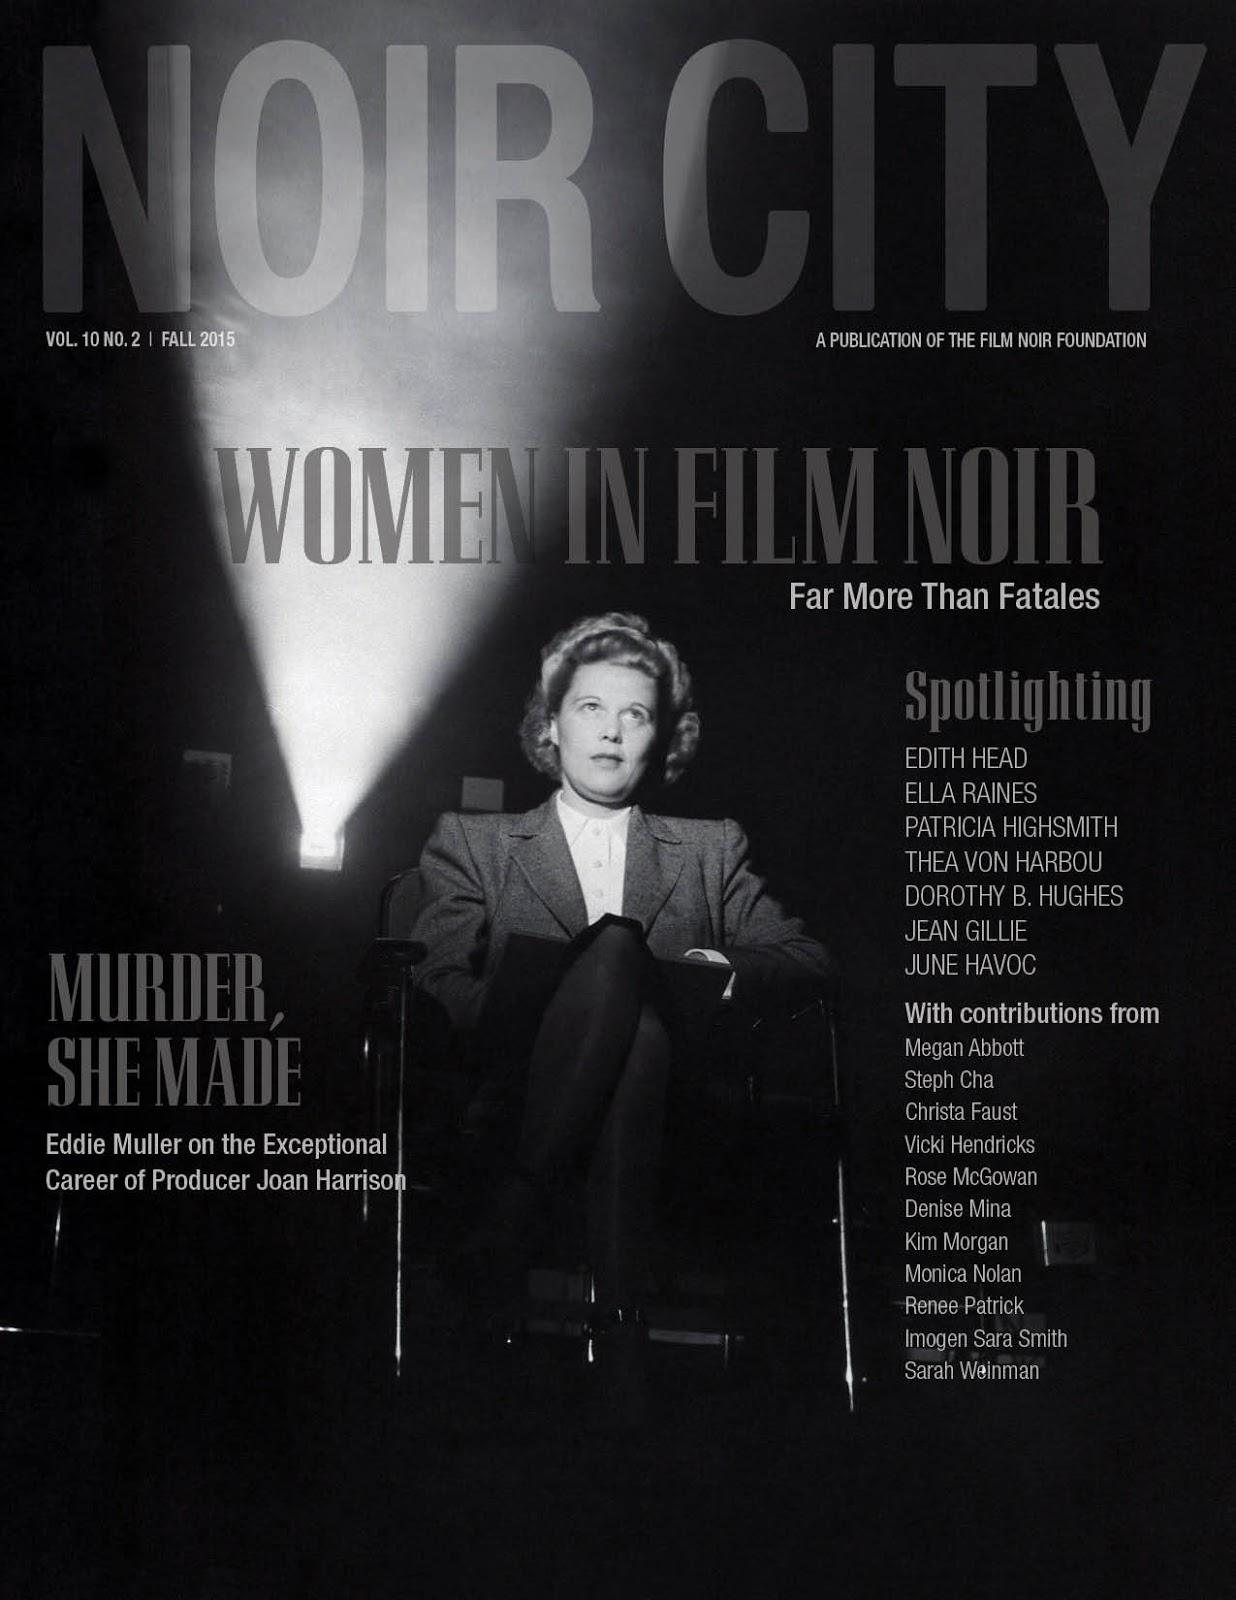 Gladys Guevarra (b. 1977),Niki Evans (born 1972) XXX pics & movies Michelle Morgan,Patricia Healy